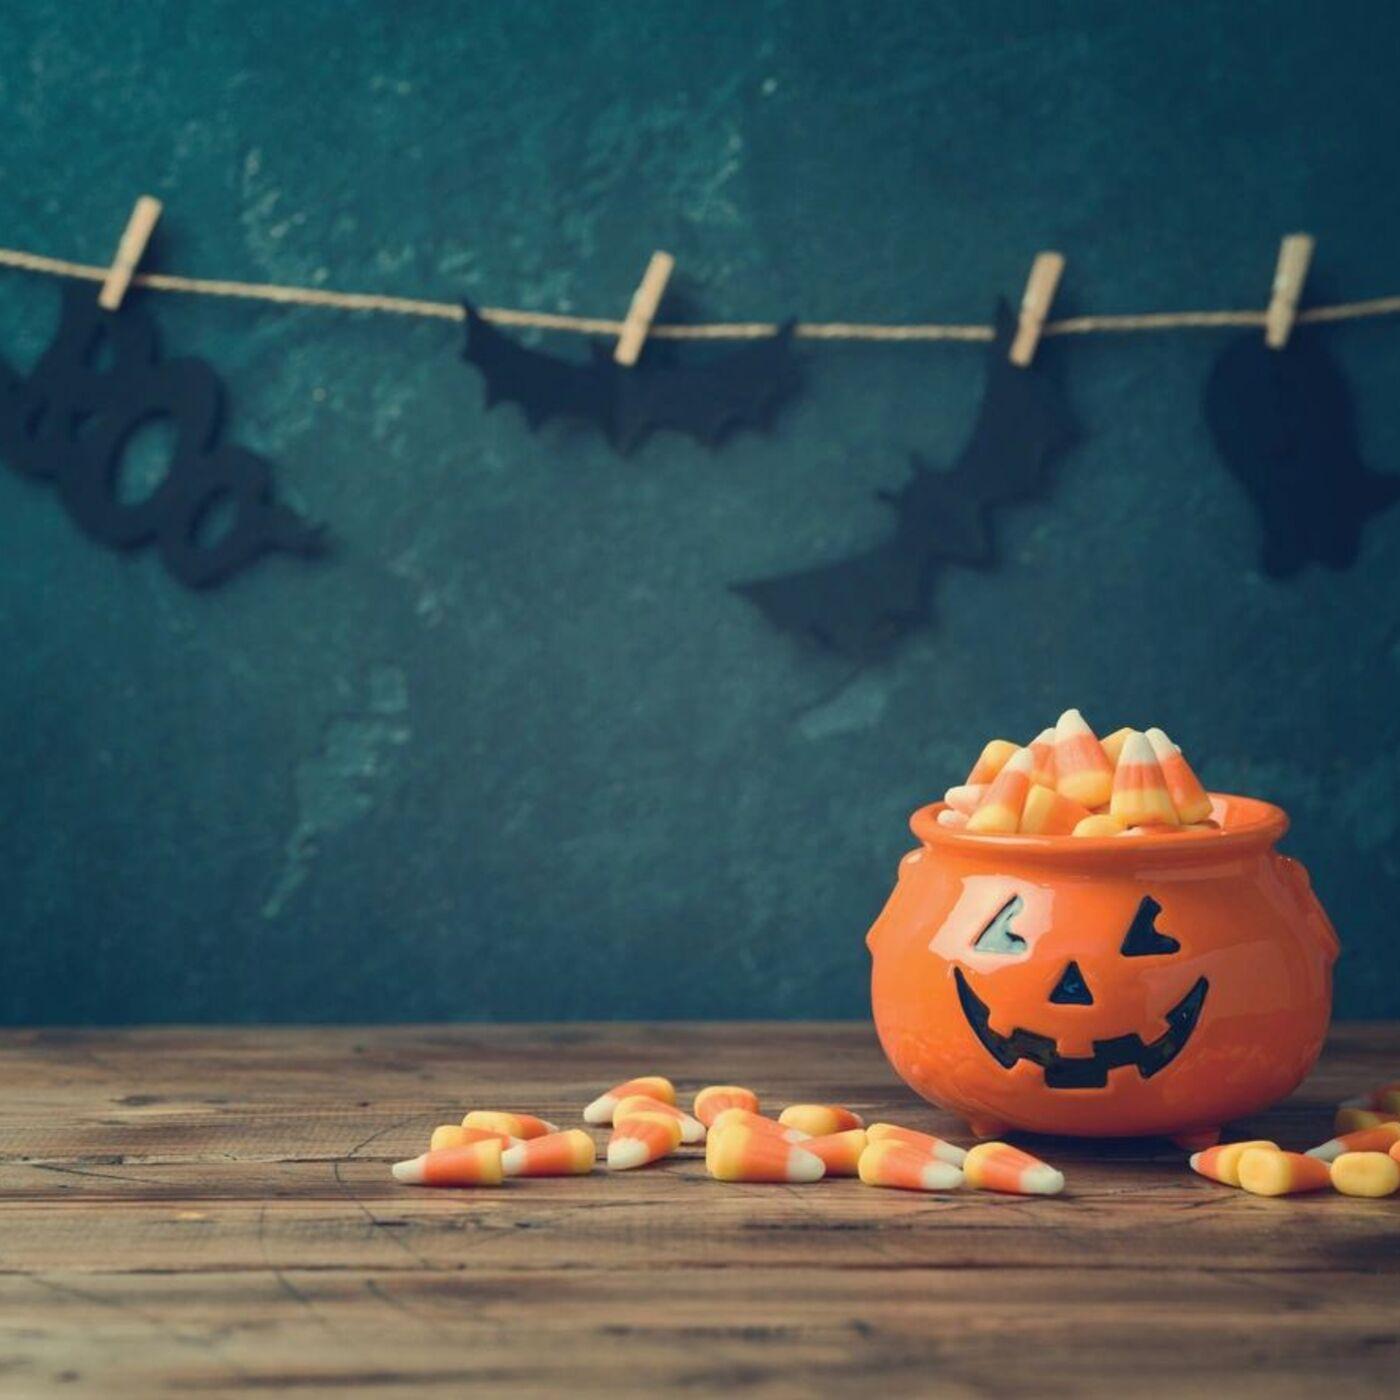 Halloween memories and shaving cream wars!